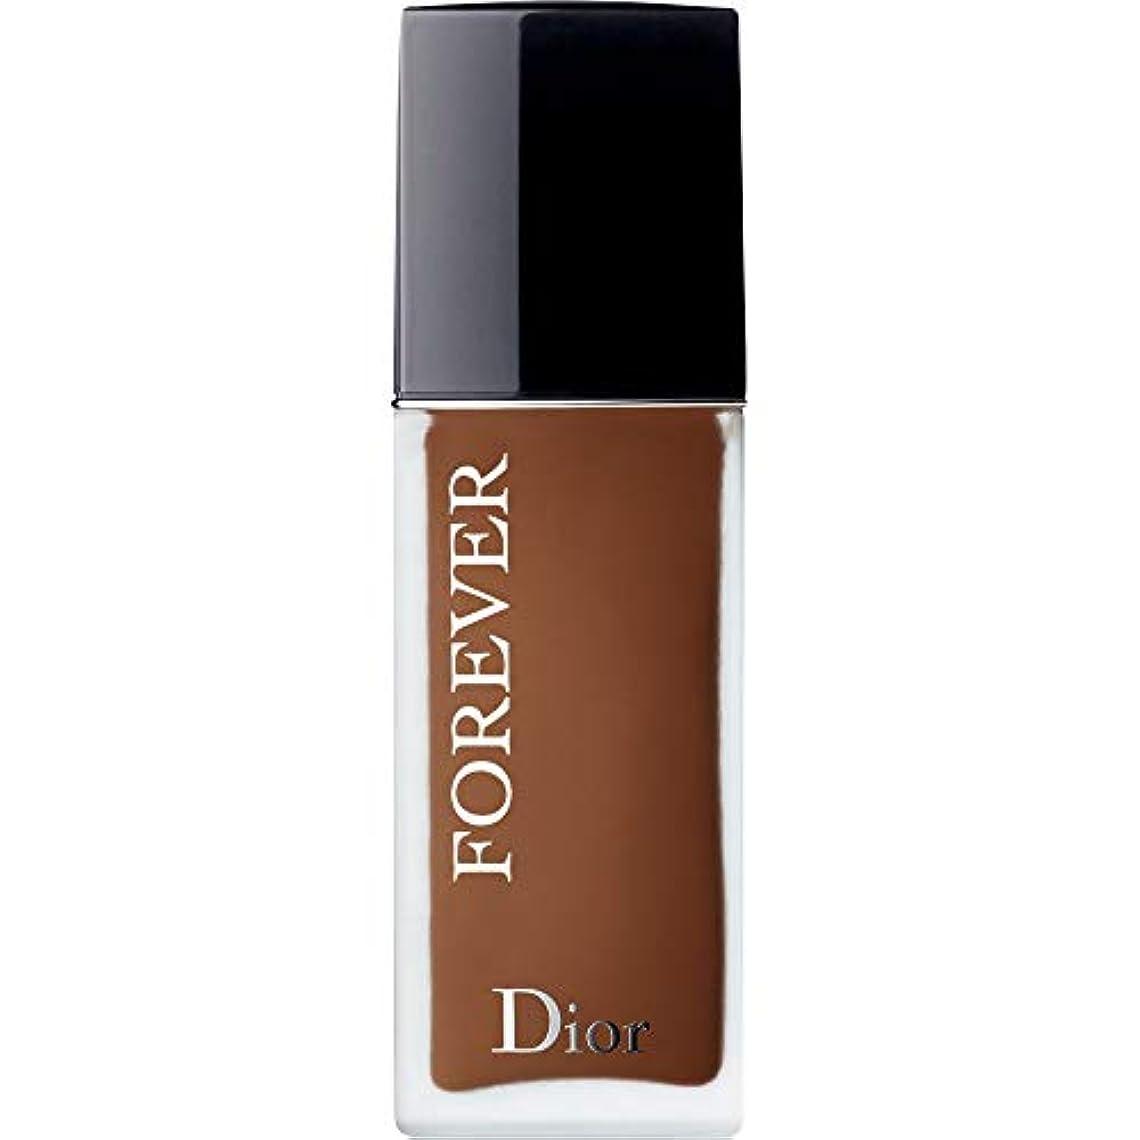 [Dior ] ディオール永遠皮膚思いやりの基盤Spf35 30ミリリットルの8N - ニュートラル(つや消し) - DIOR Forever Skin-Caring Foundation SPF35 30ml 8N -...